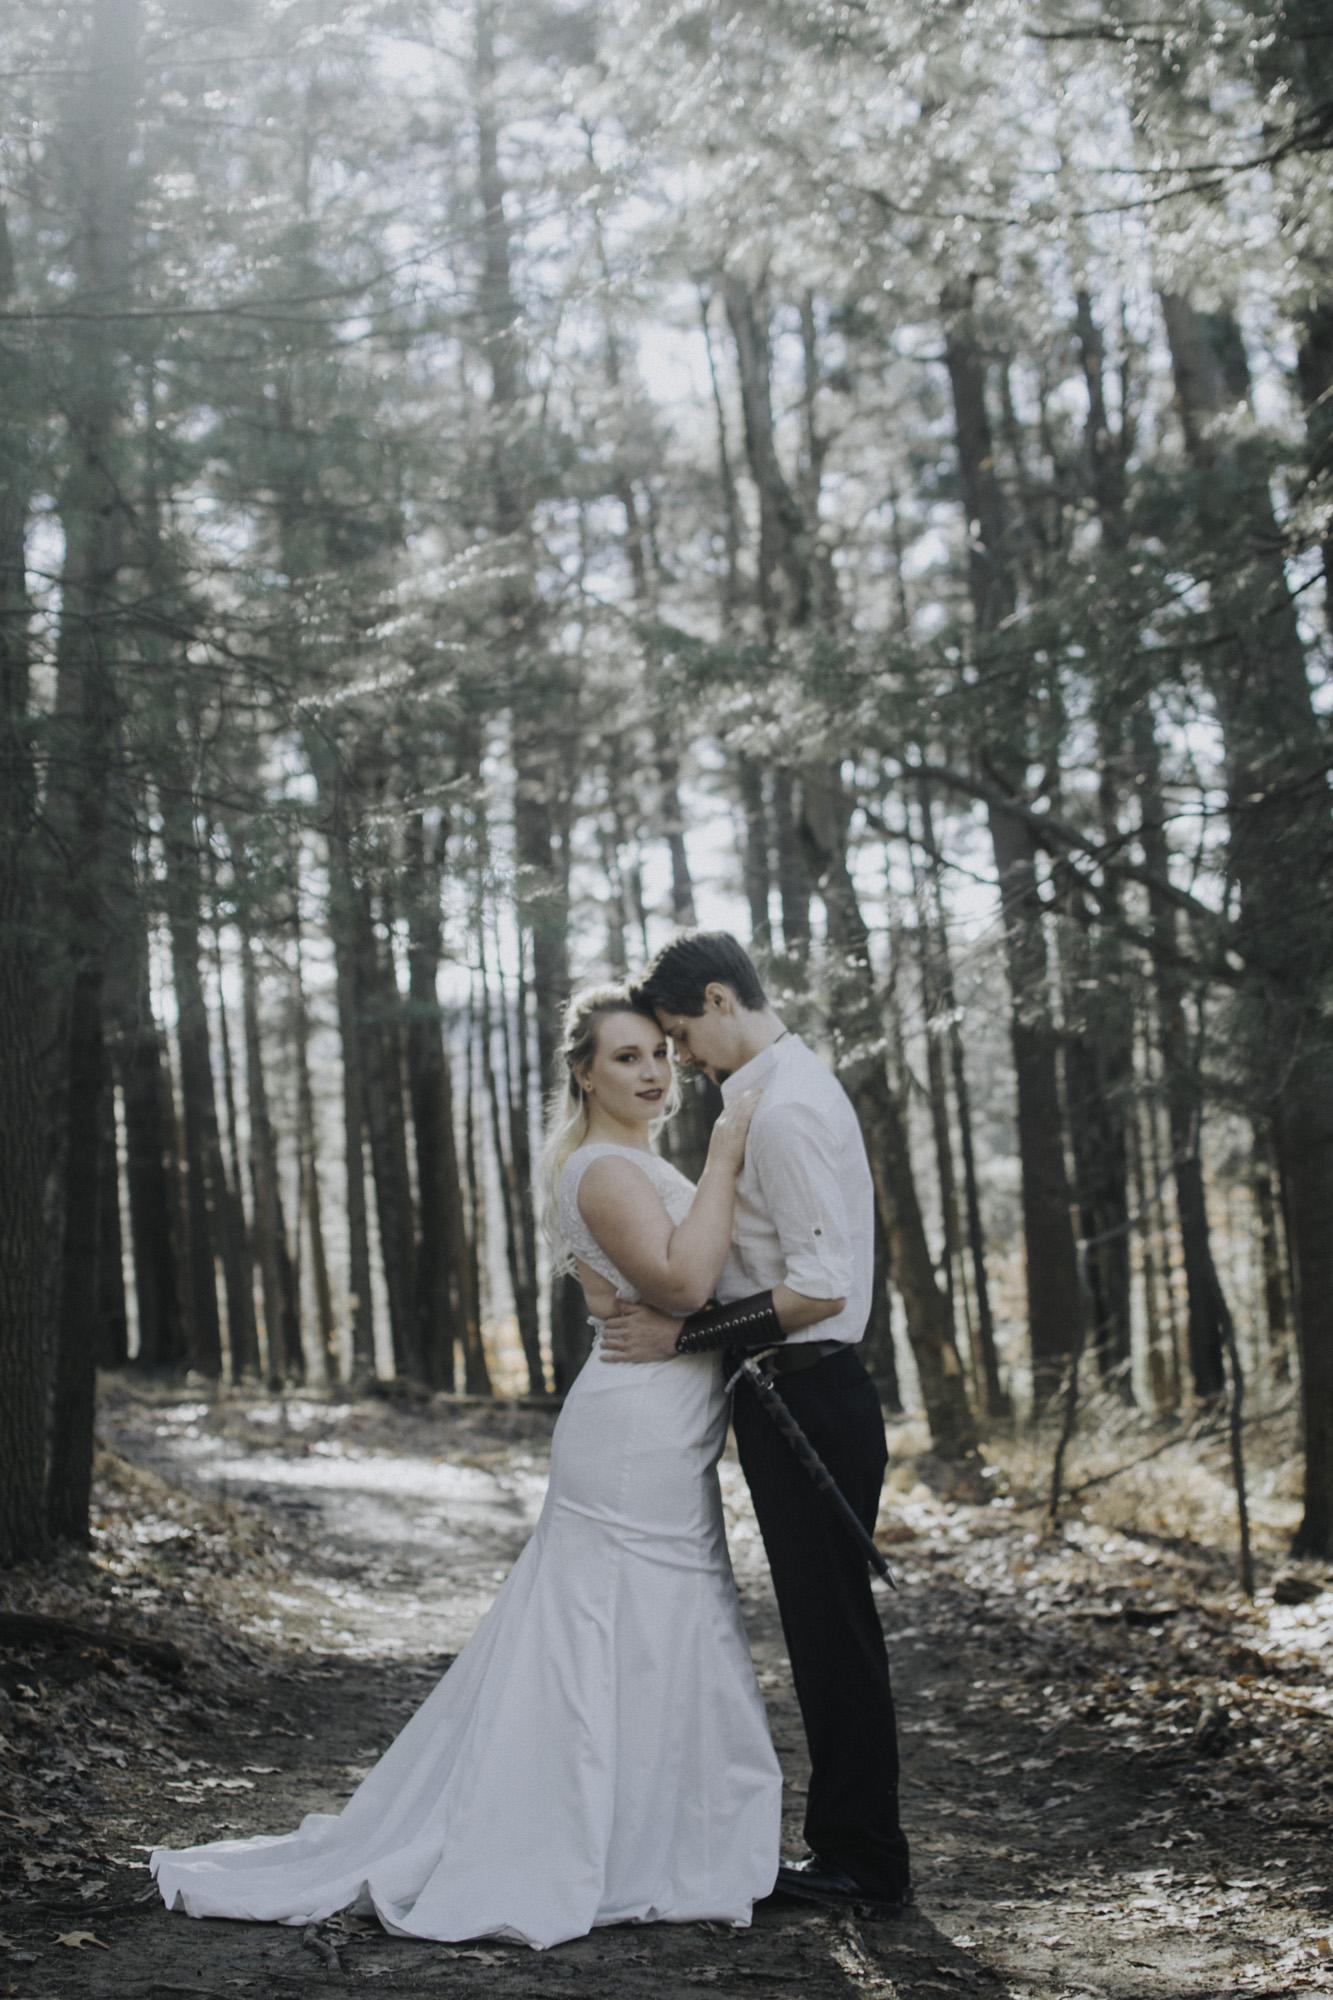 Cate_Ann_Photography_Dayton_Ohio_Wedding_Elopement_And_Engagement_PhotographerDSC_6340.jpg